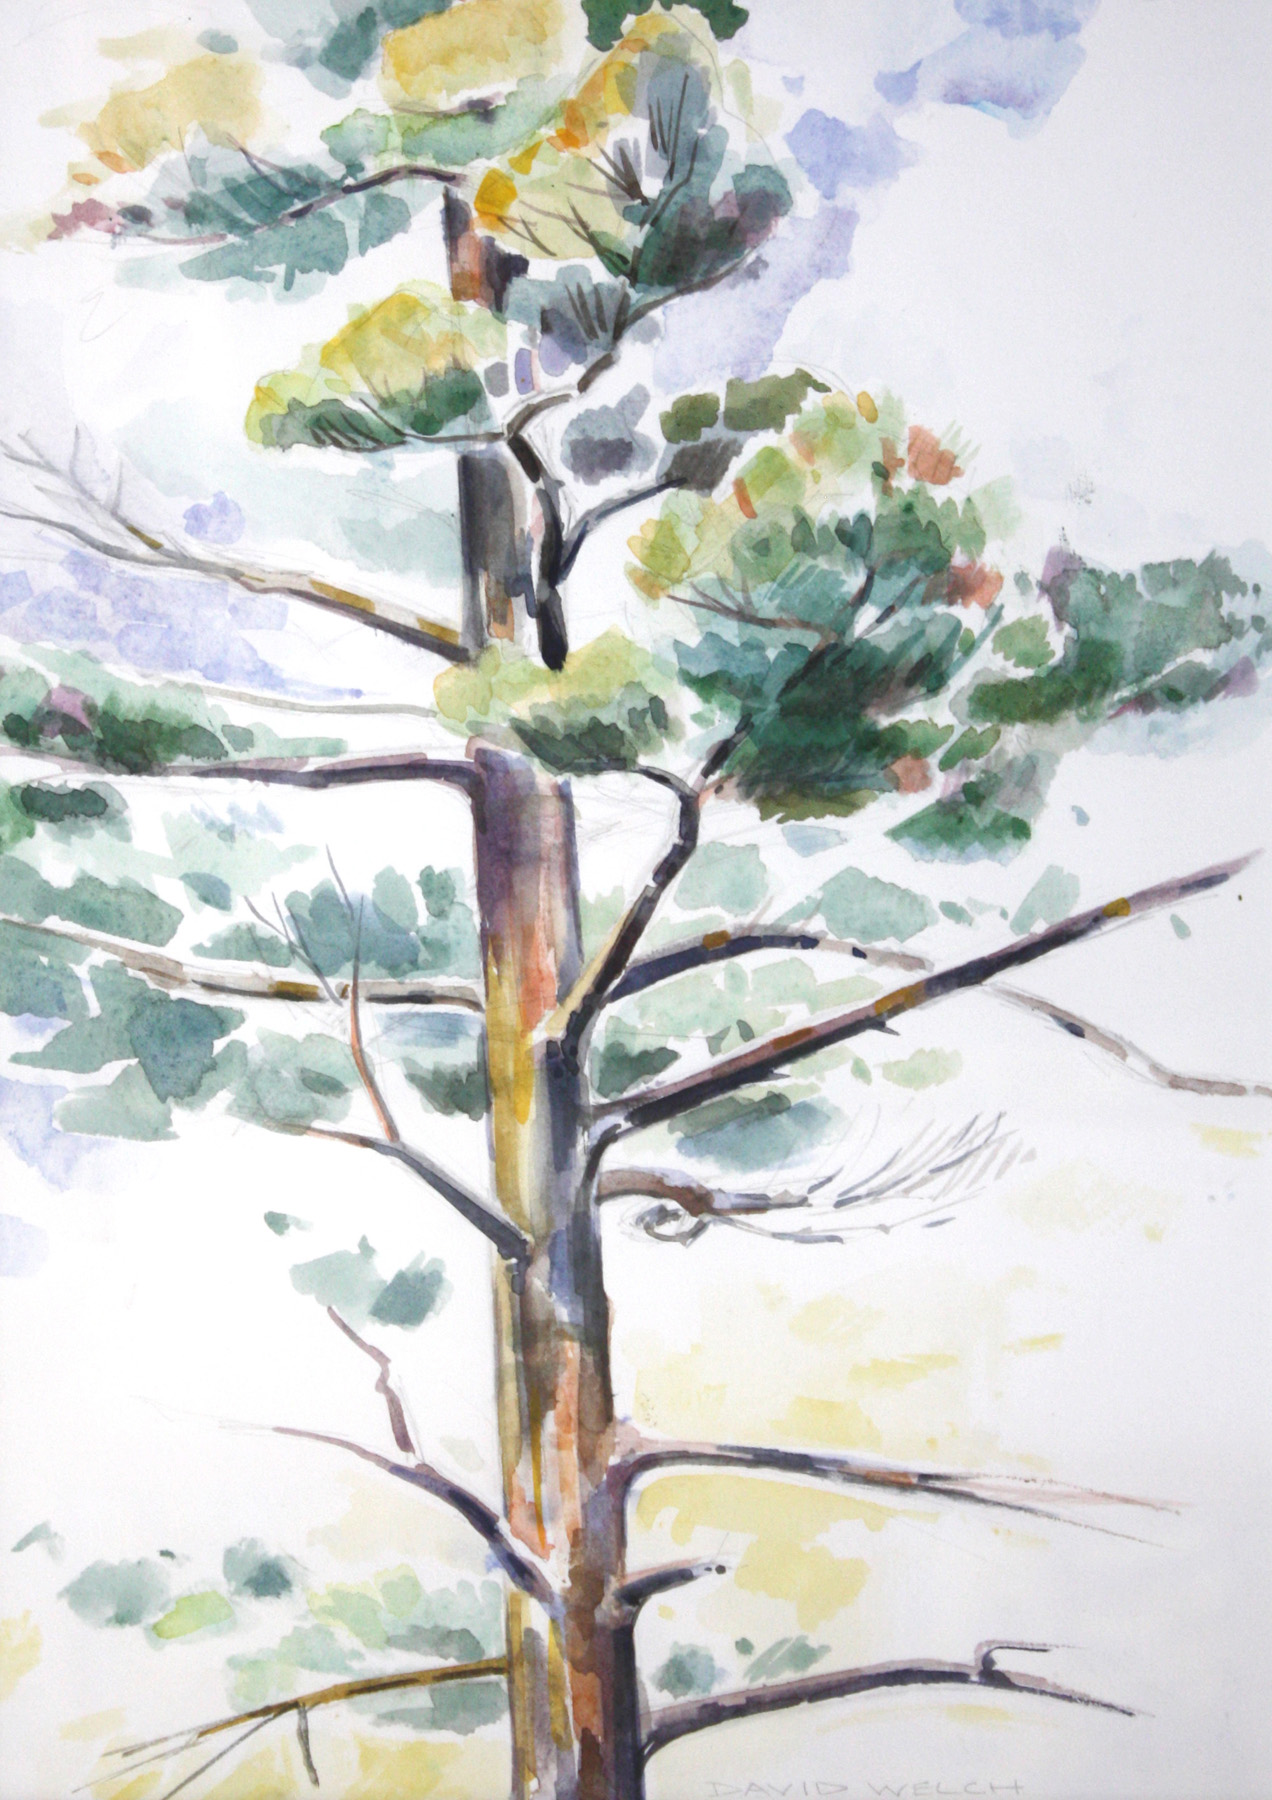 Windswept, David Welch